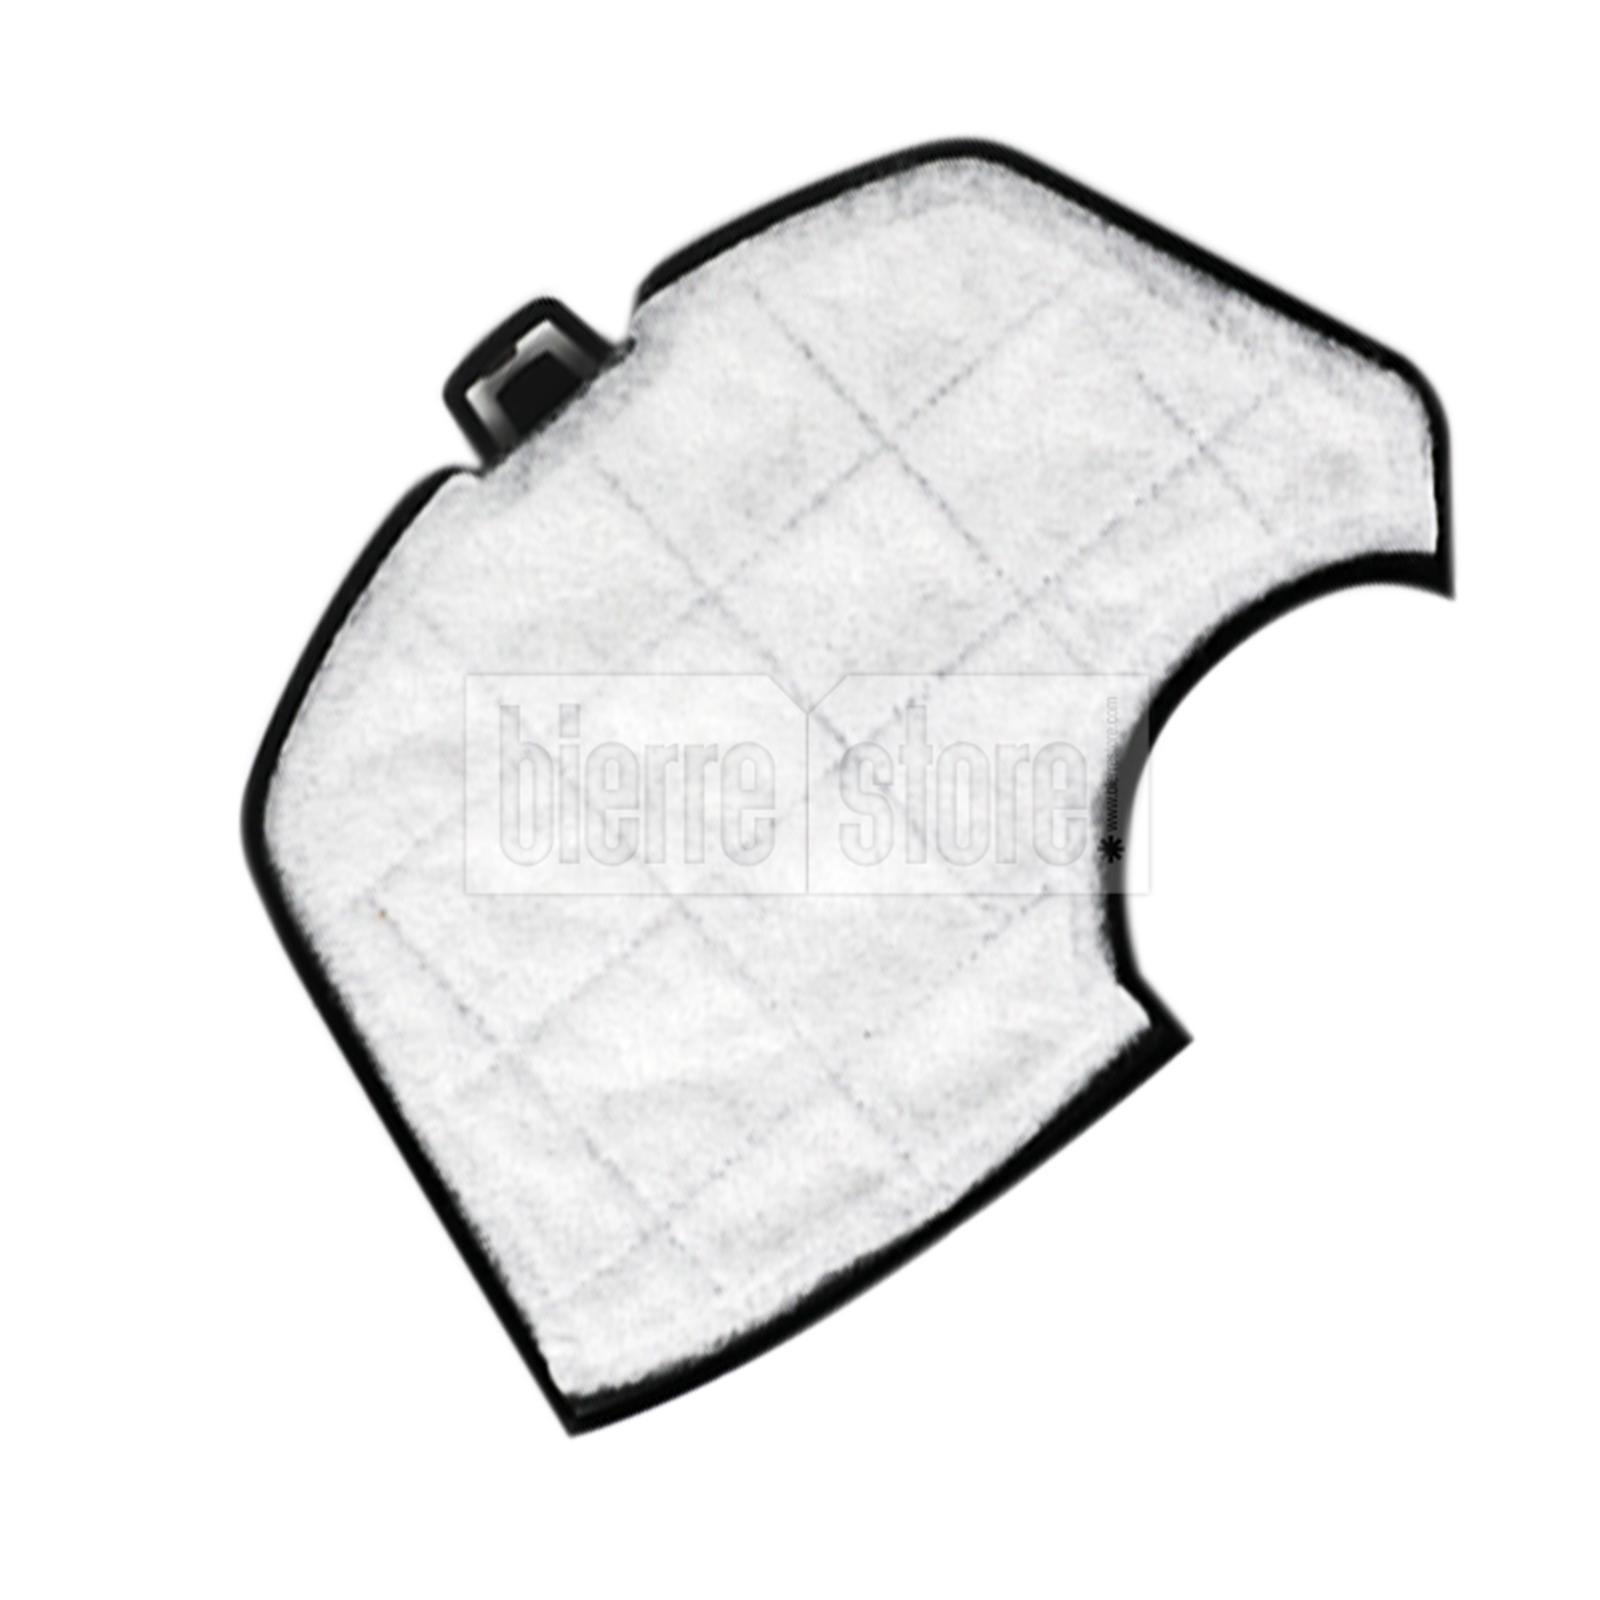 vorwerk filtro motore folletto folletto vk 140 vk 150 originale